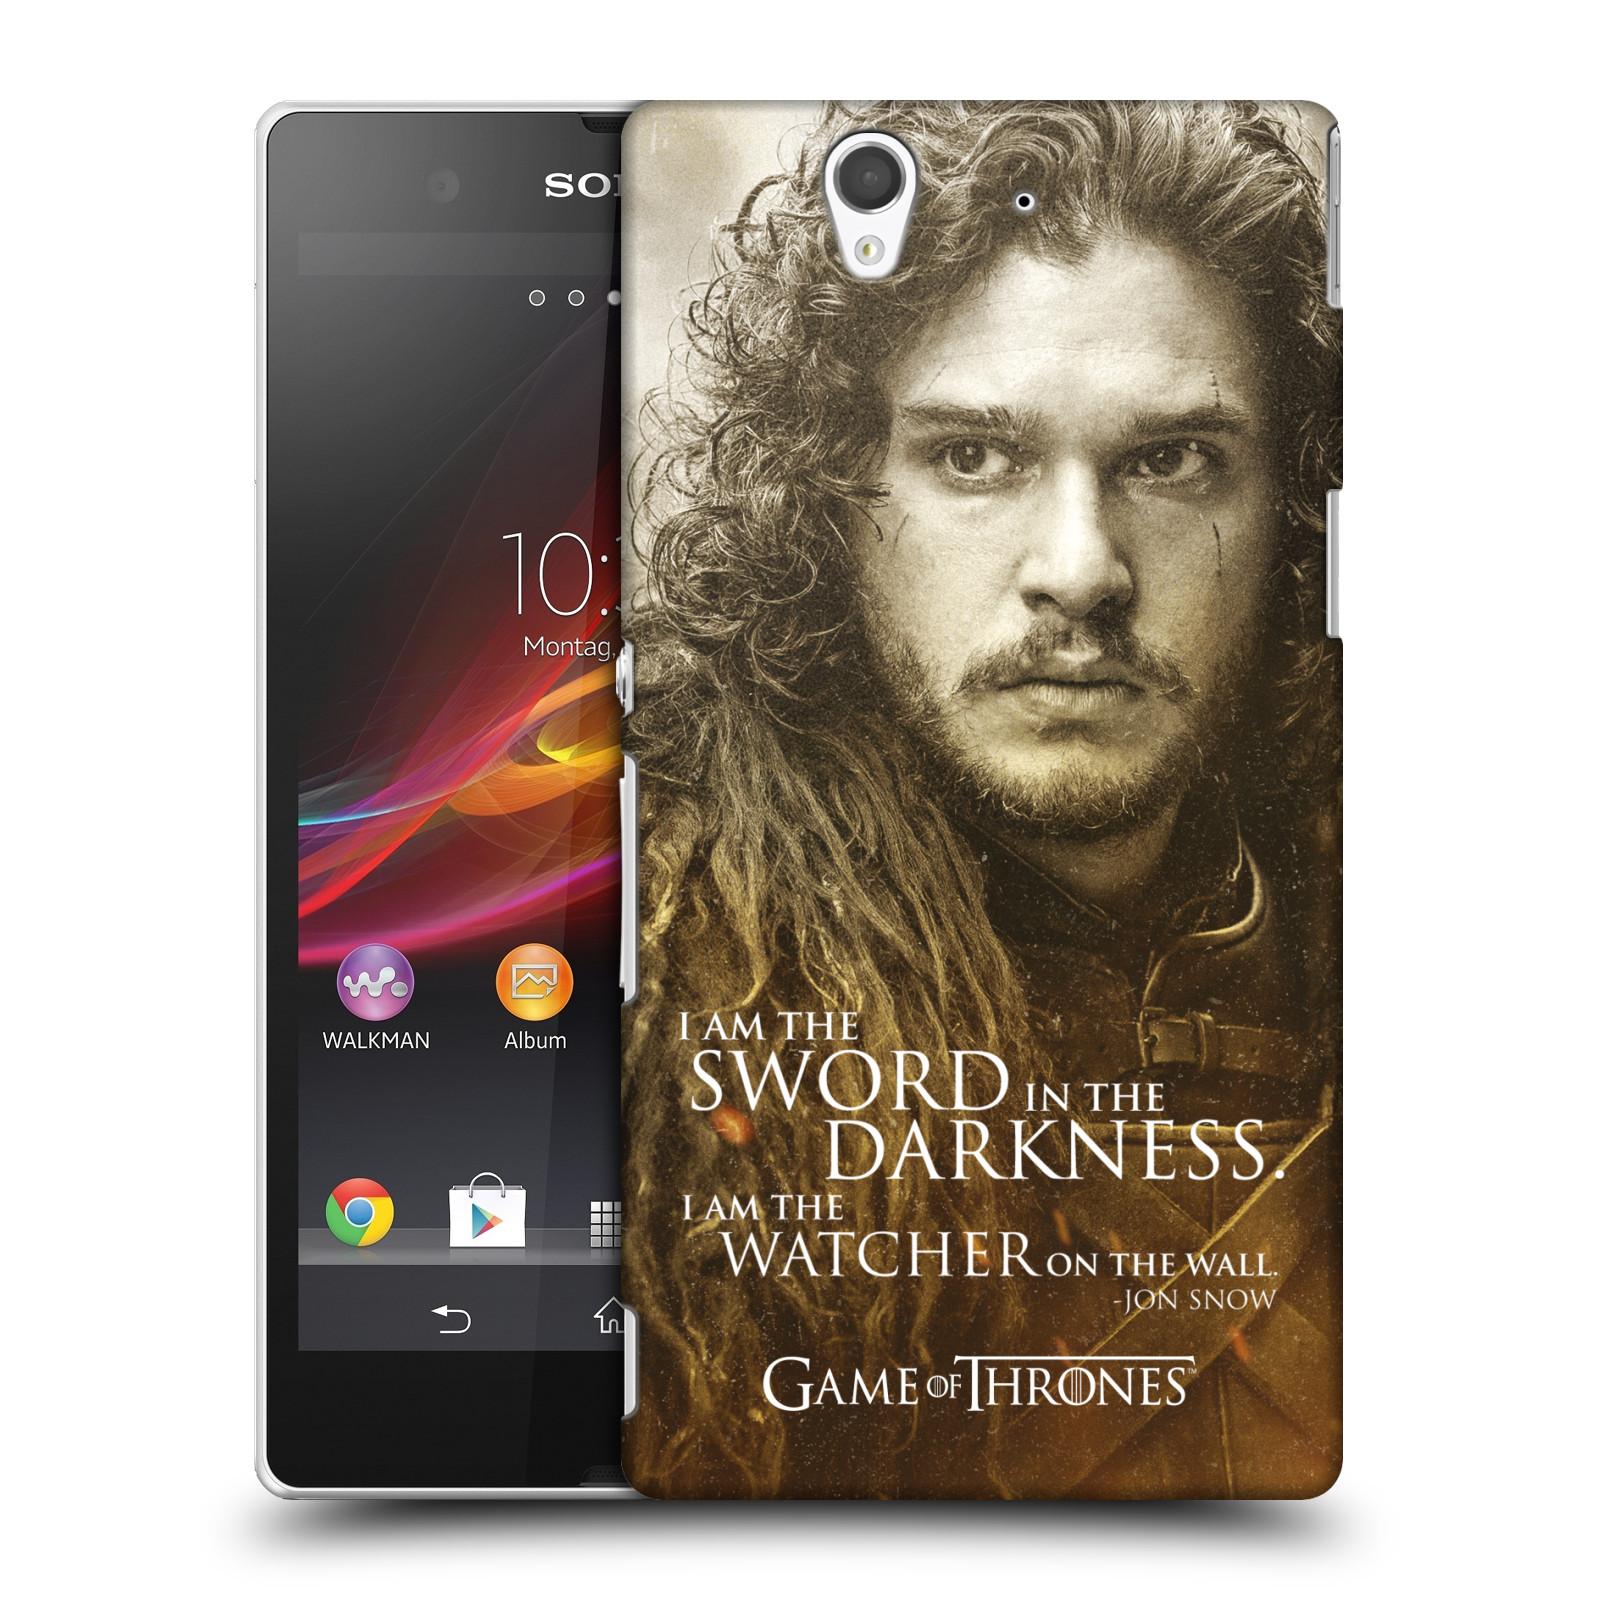 Plastové pouzdro na mobil Sony Xperia Z C6603 HEAD CASE Hra o trůny - Jon Snow (Plastový kryt či obal na mobilní telefon s licencovaným motivem Hra o trůny - Game Of Thrones pro Sony Xperia Z)